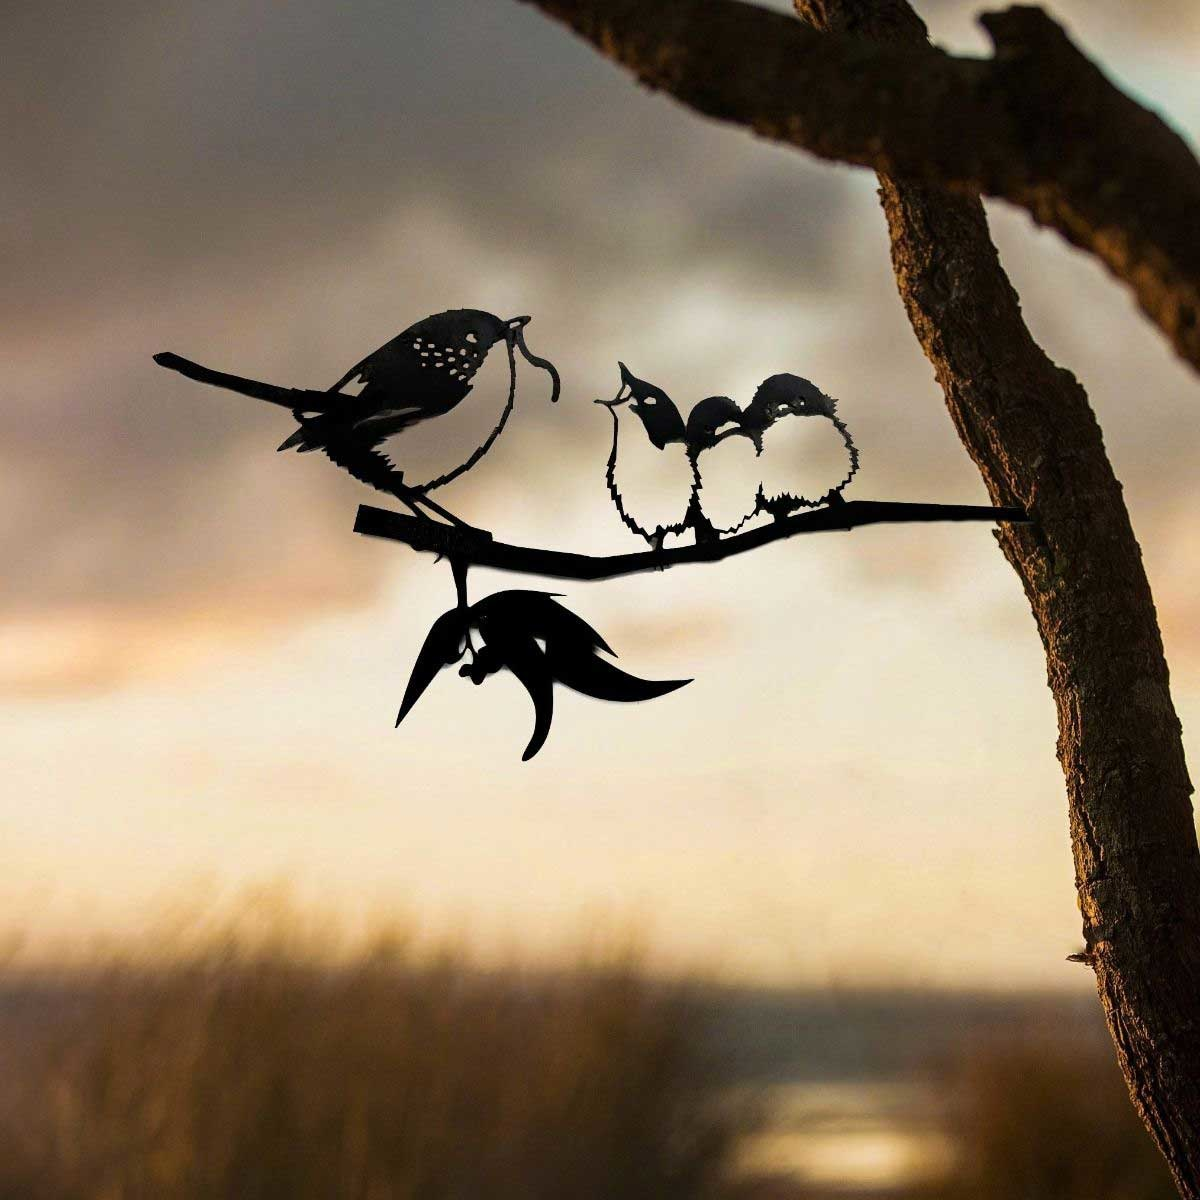 Blue Wren with Babies